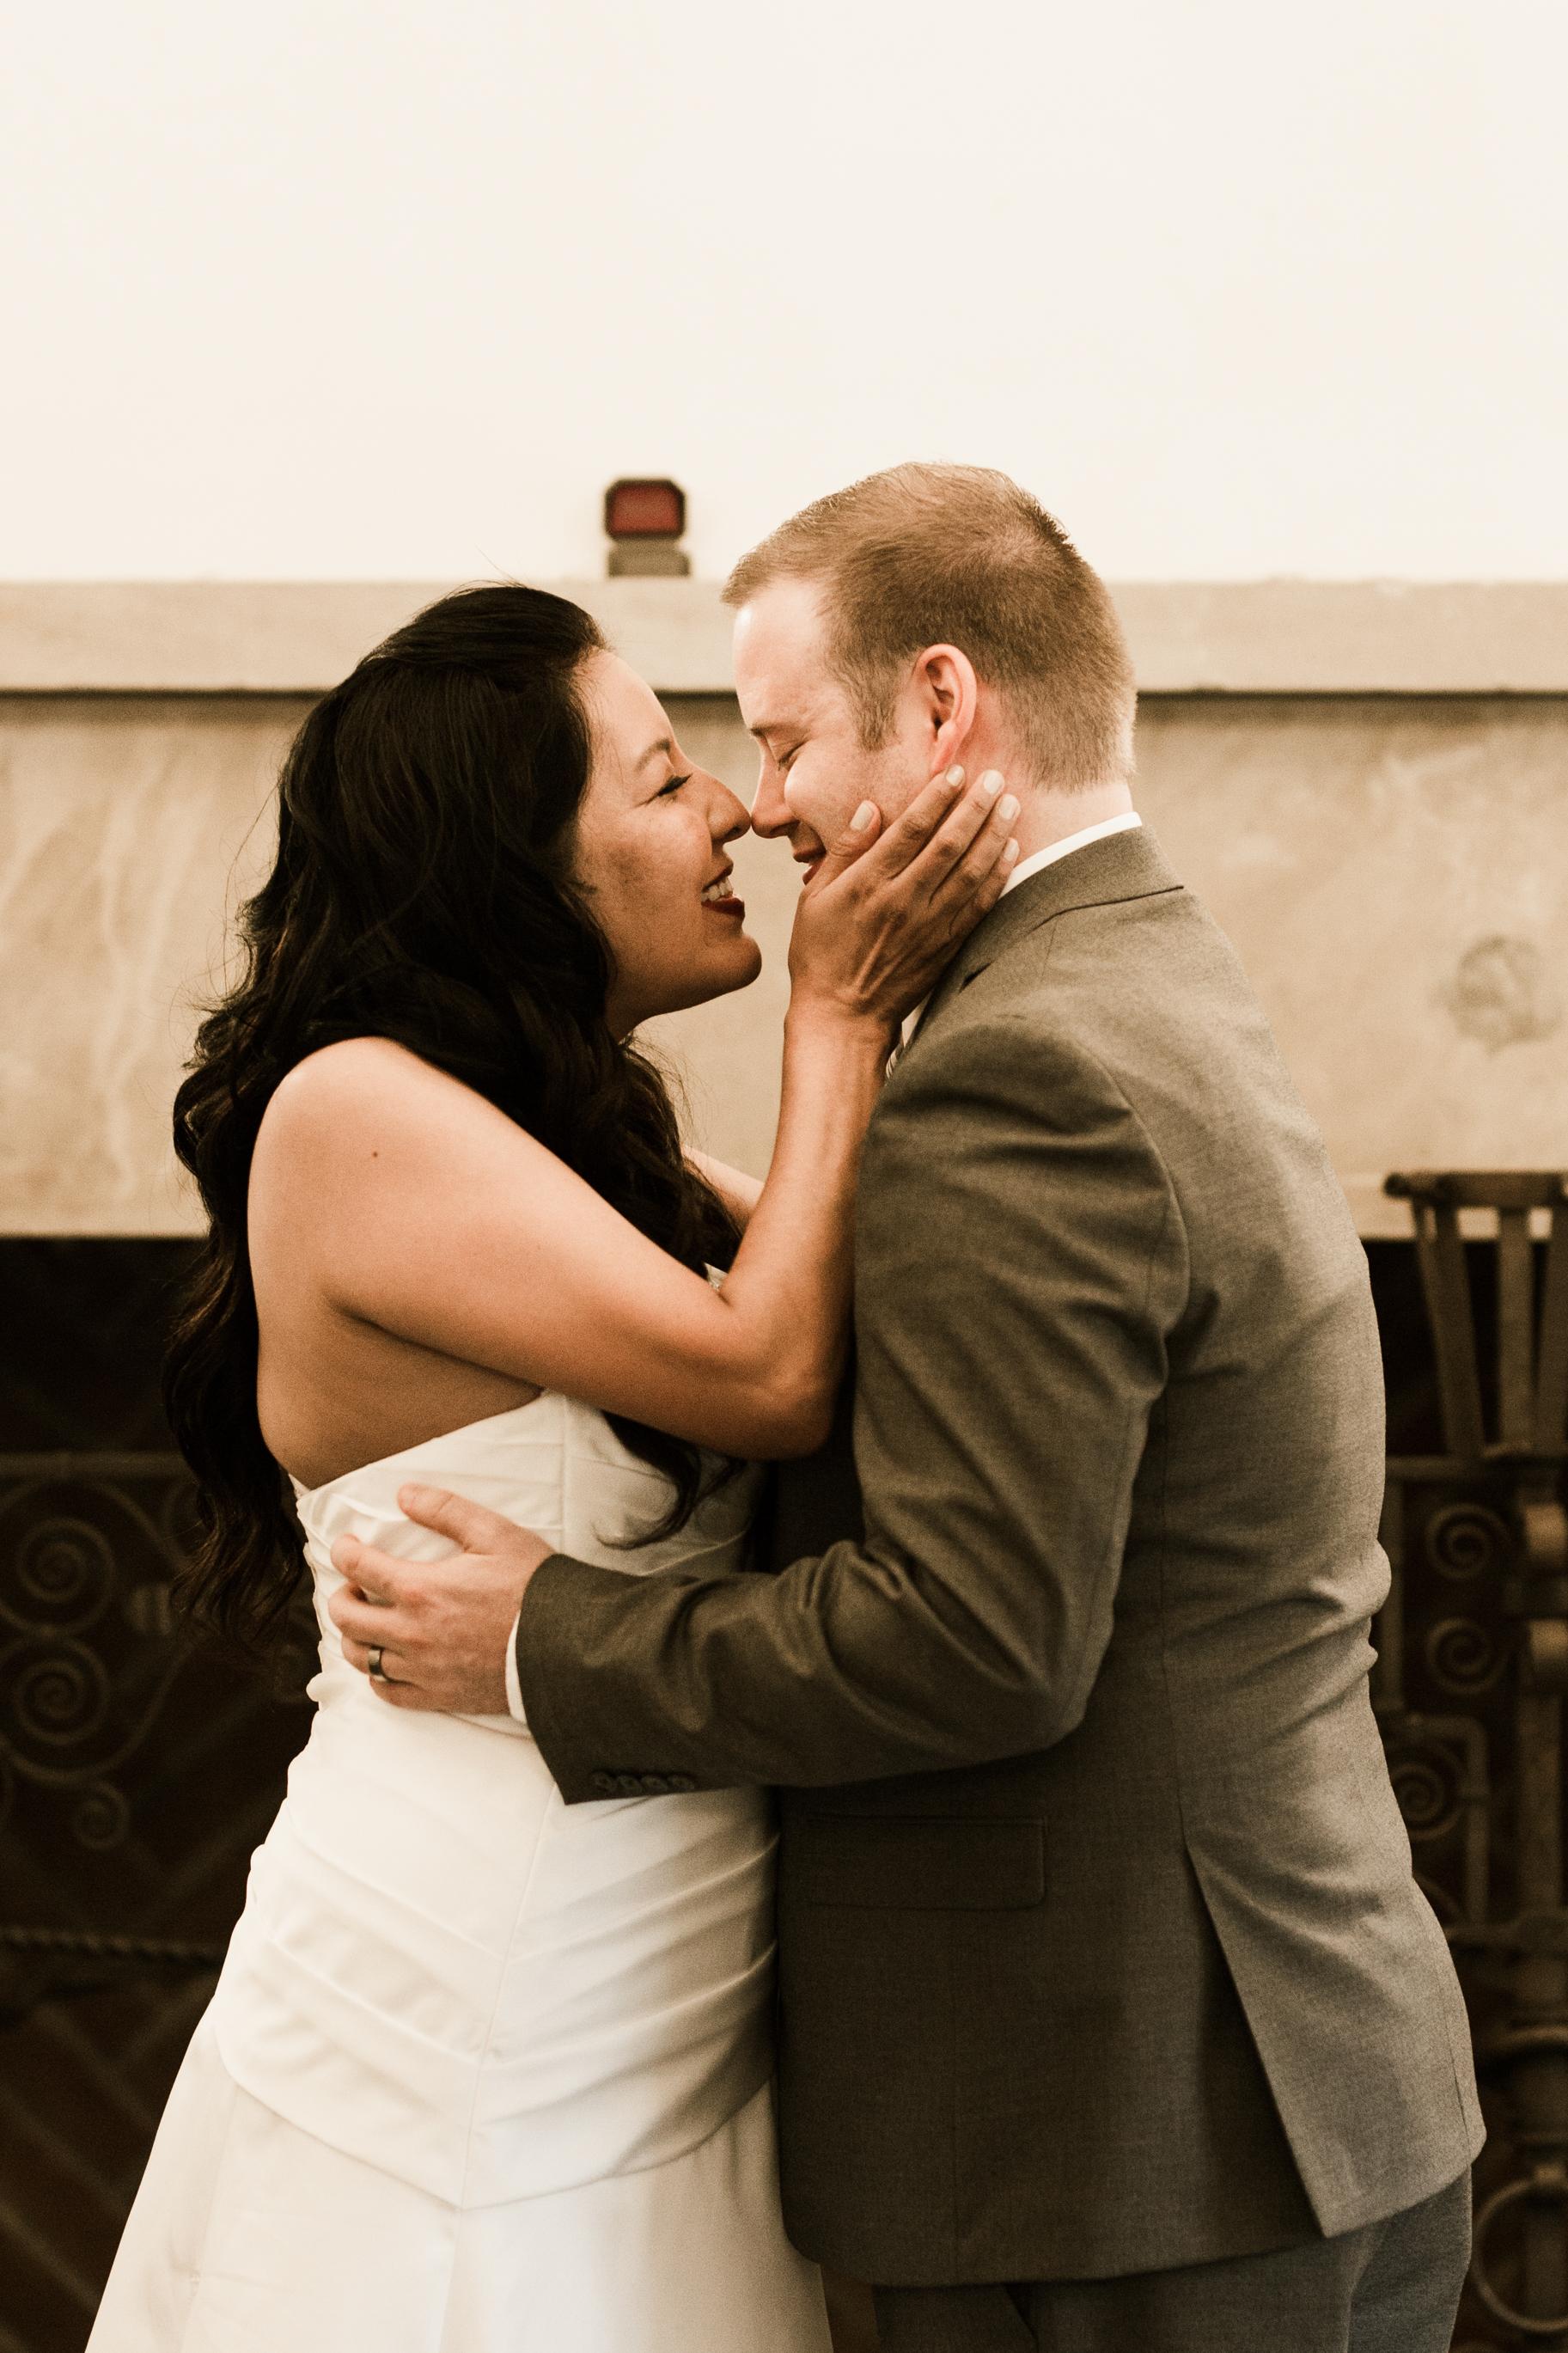 Kentucky Wedding Louisville Wedding Photographer 2018 Crystal Ludwick Photo Louisville Wedding Photographer Kentucky Wedding Photographer (51 of 76).jpg